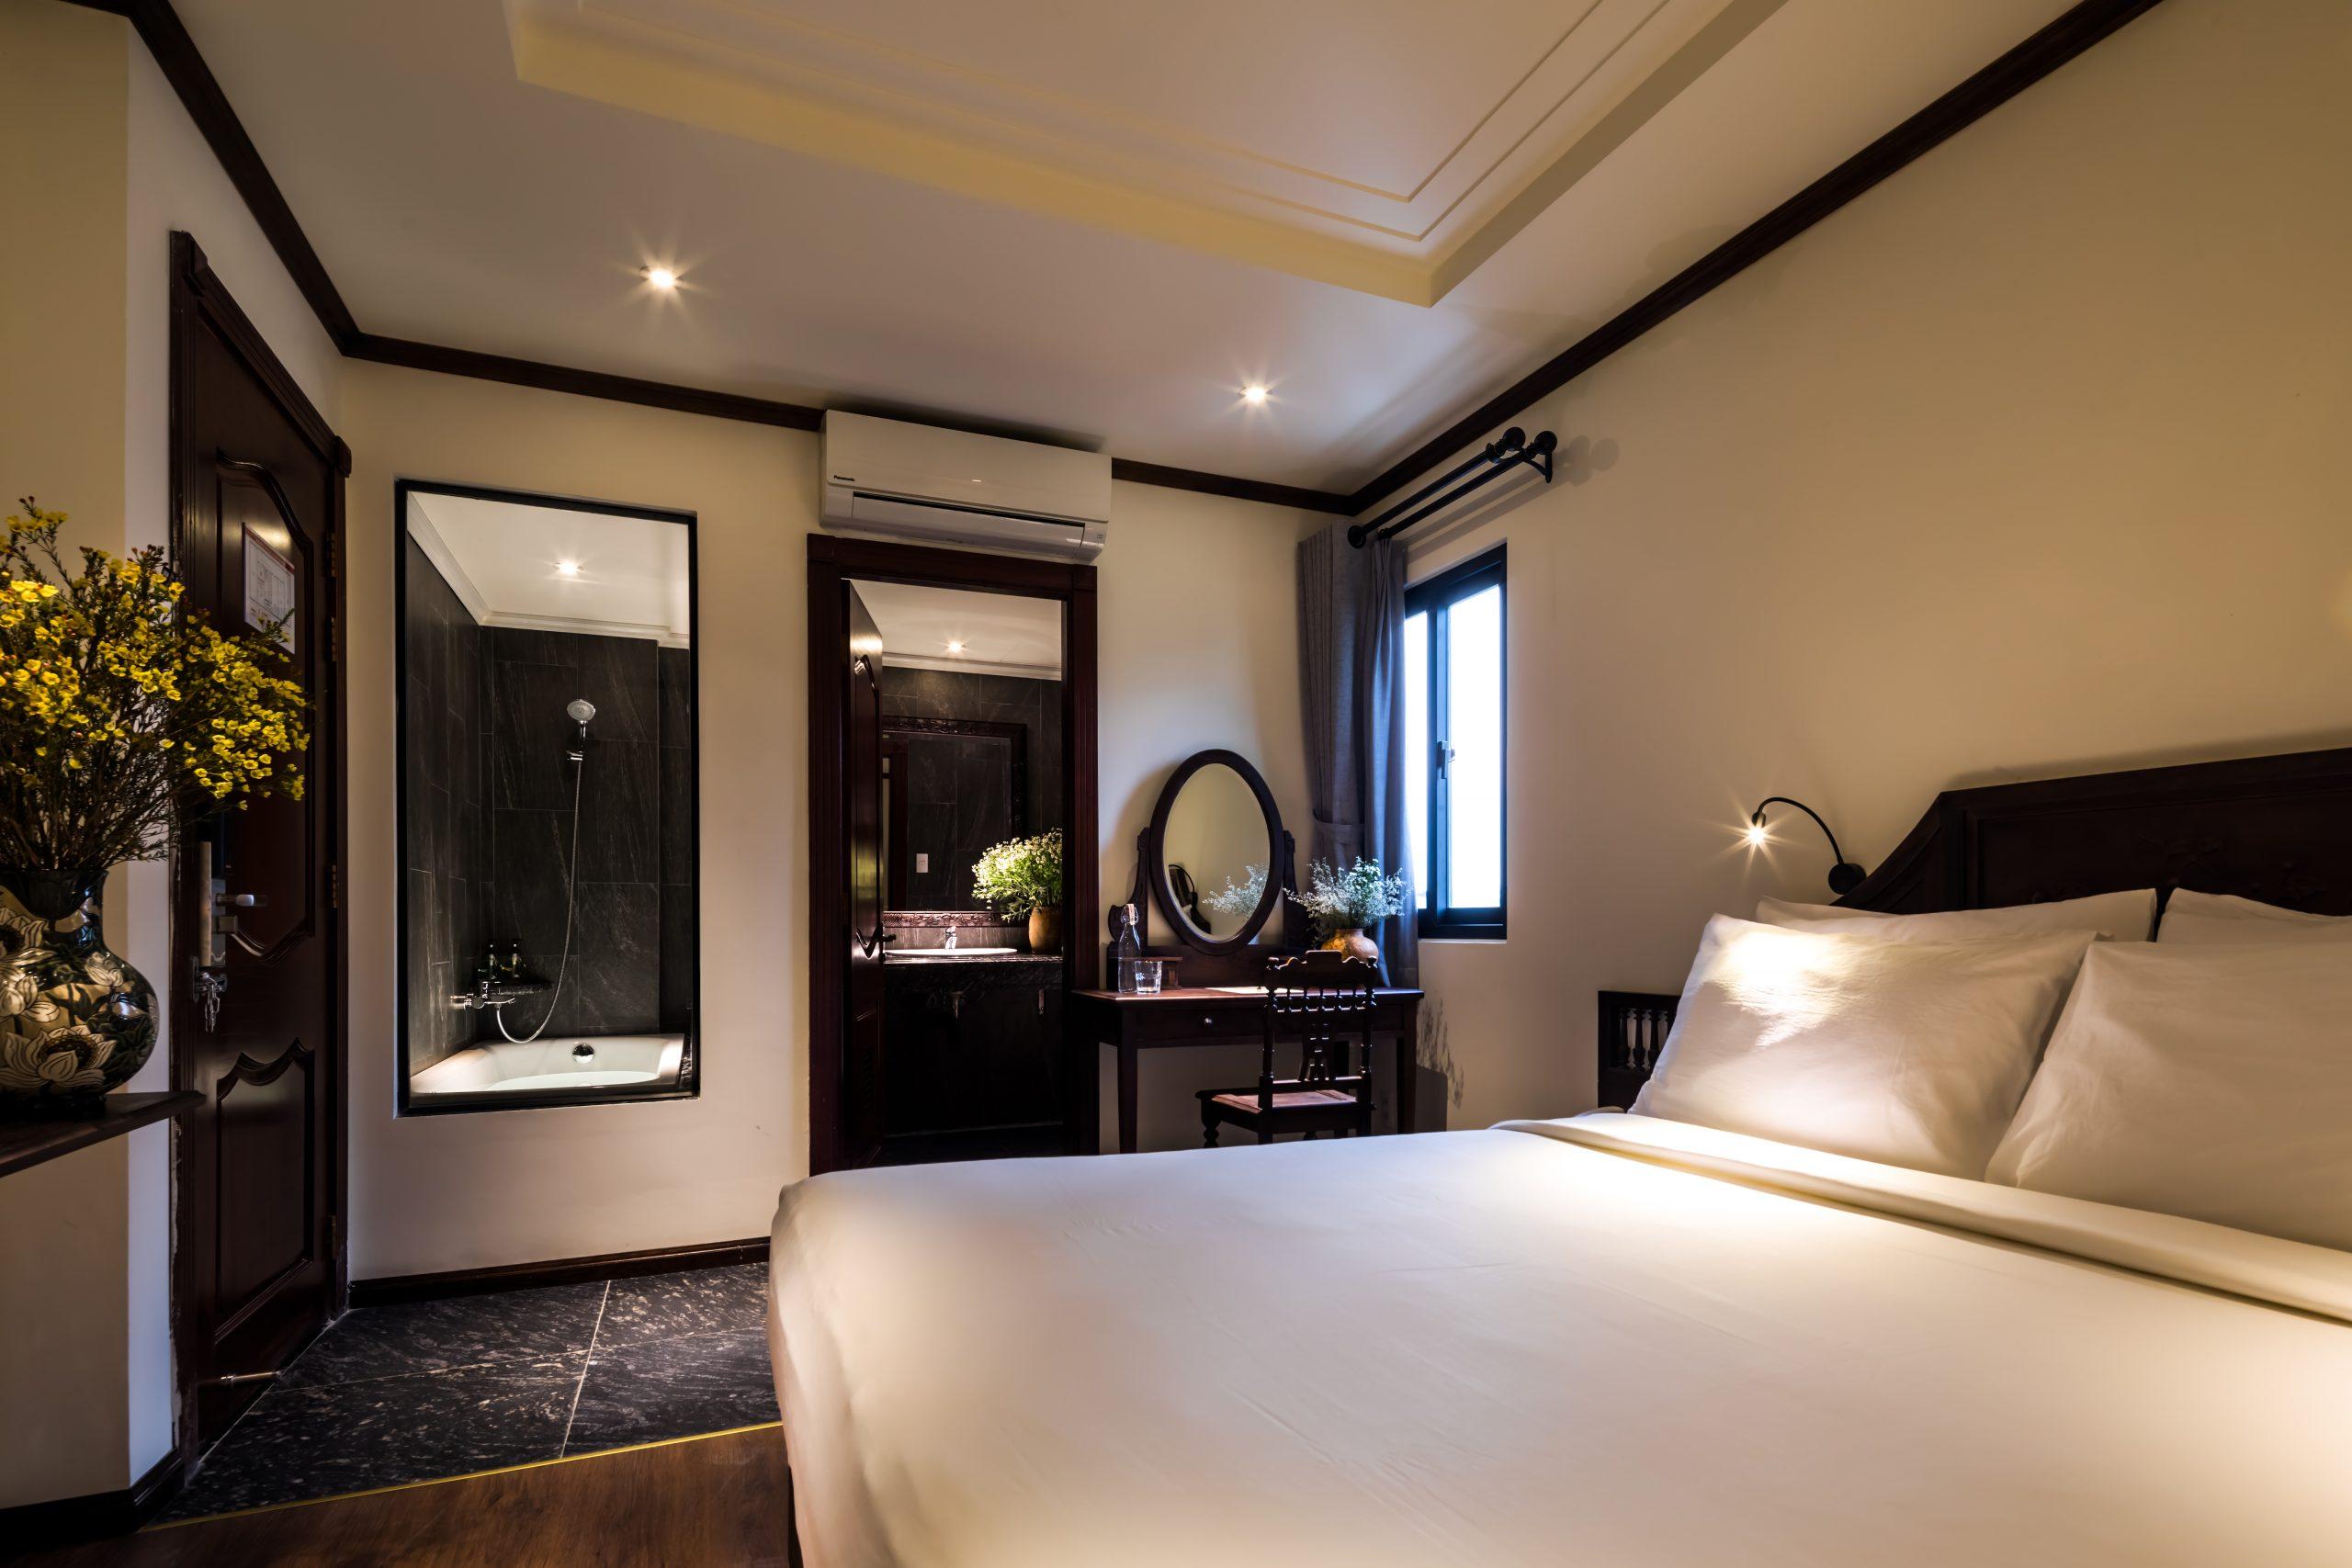 Junior Double Room (bath)